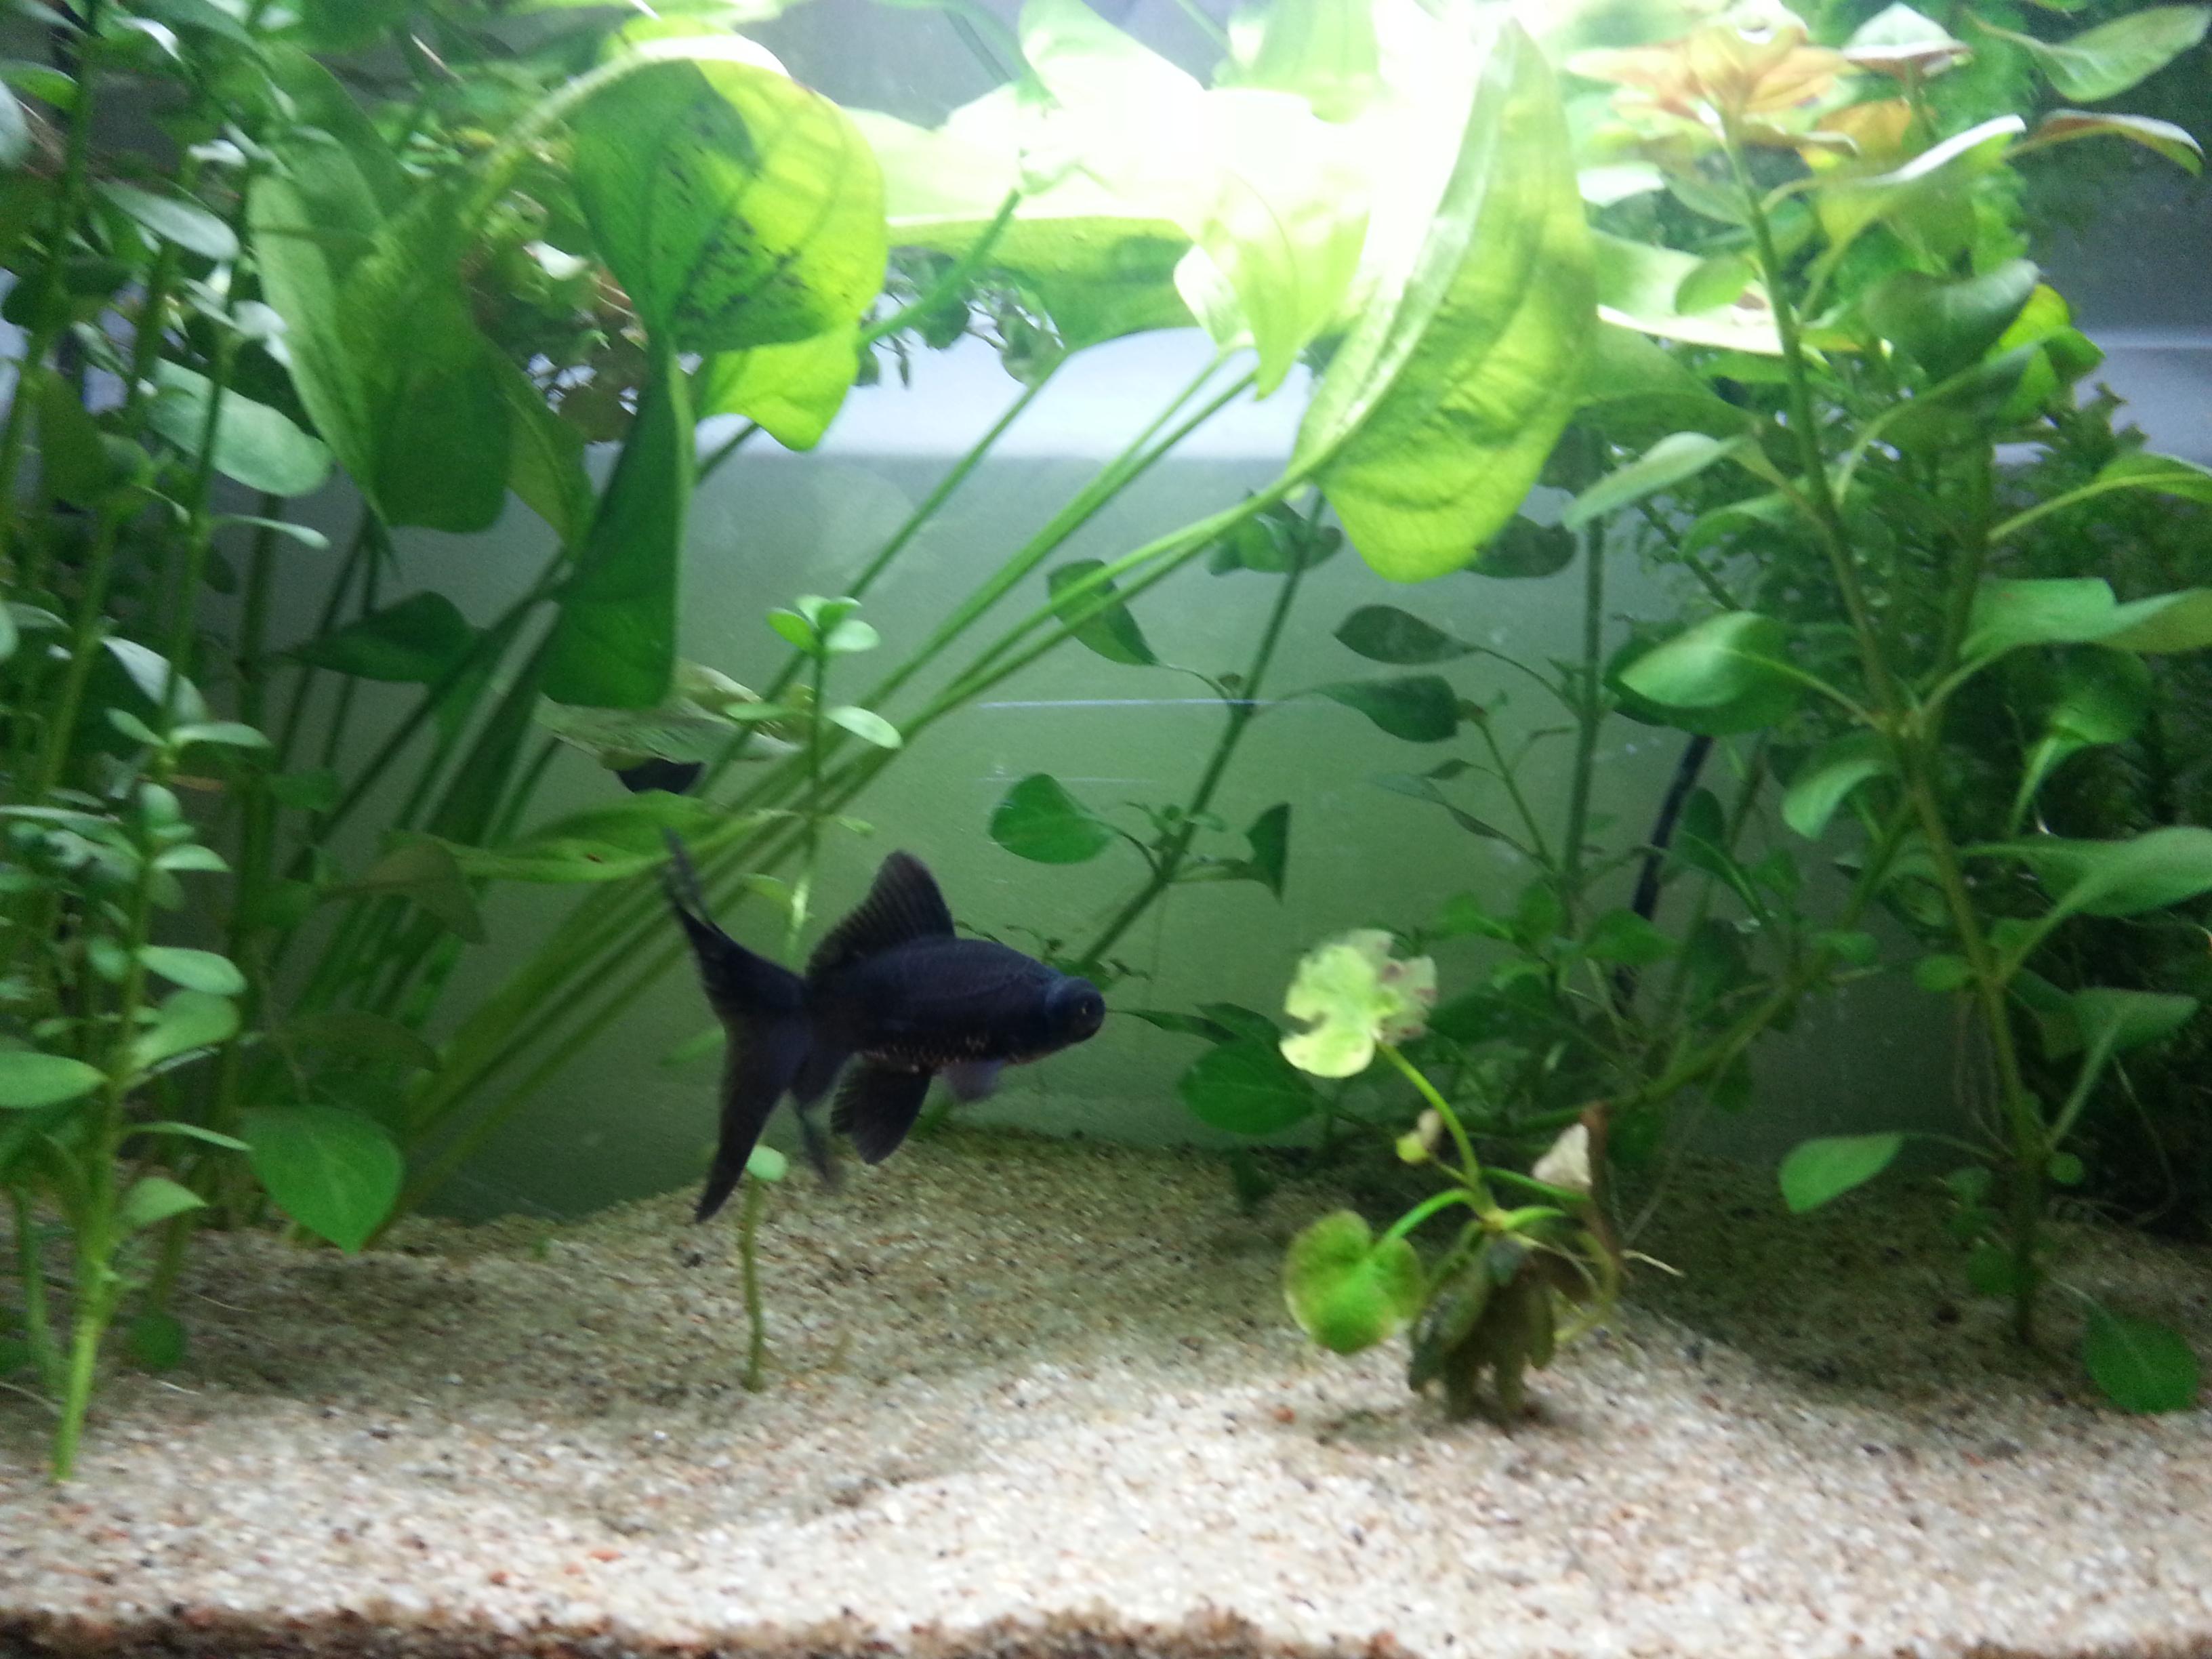 plante dans un aquarium 67914120130624002824